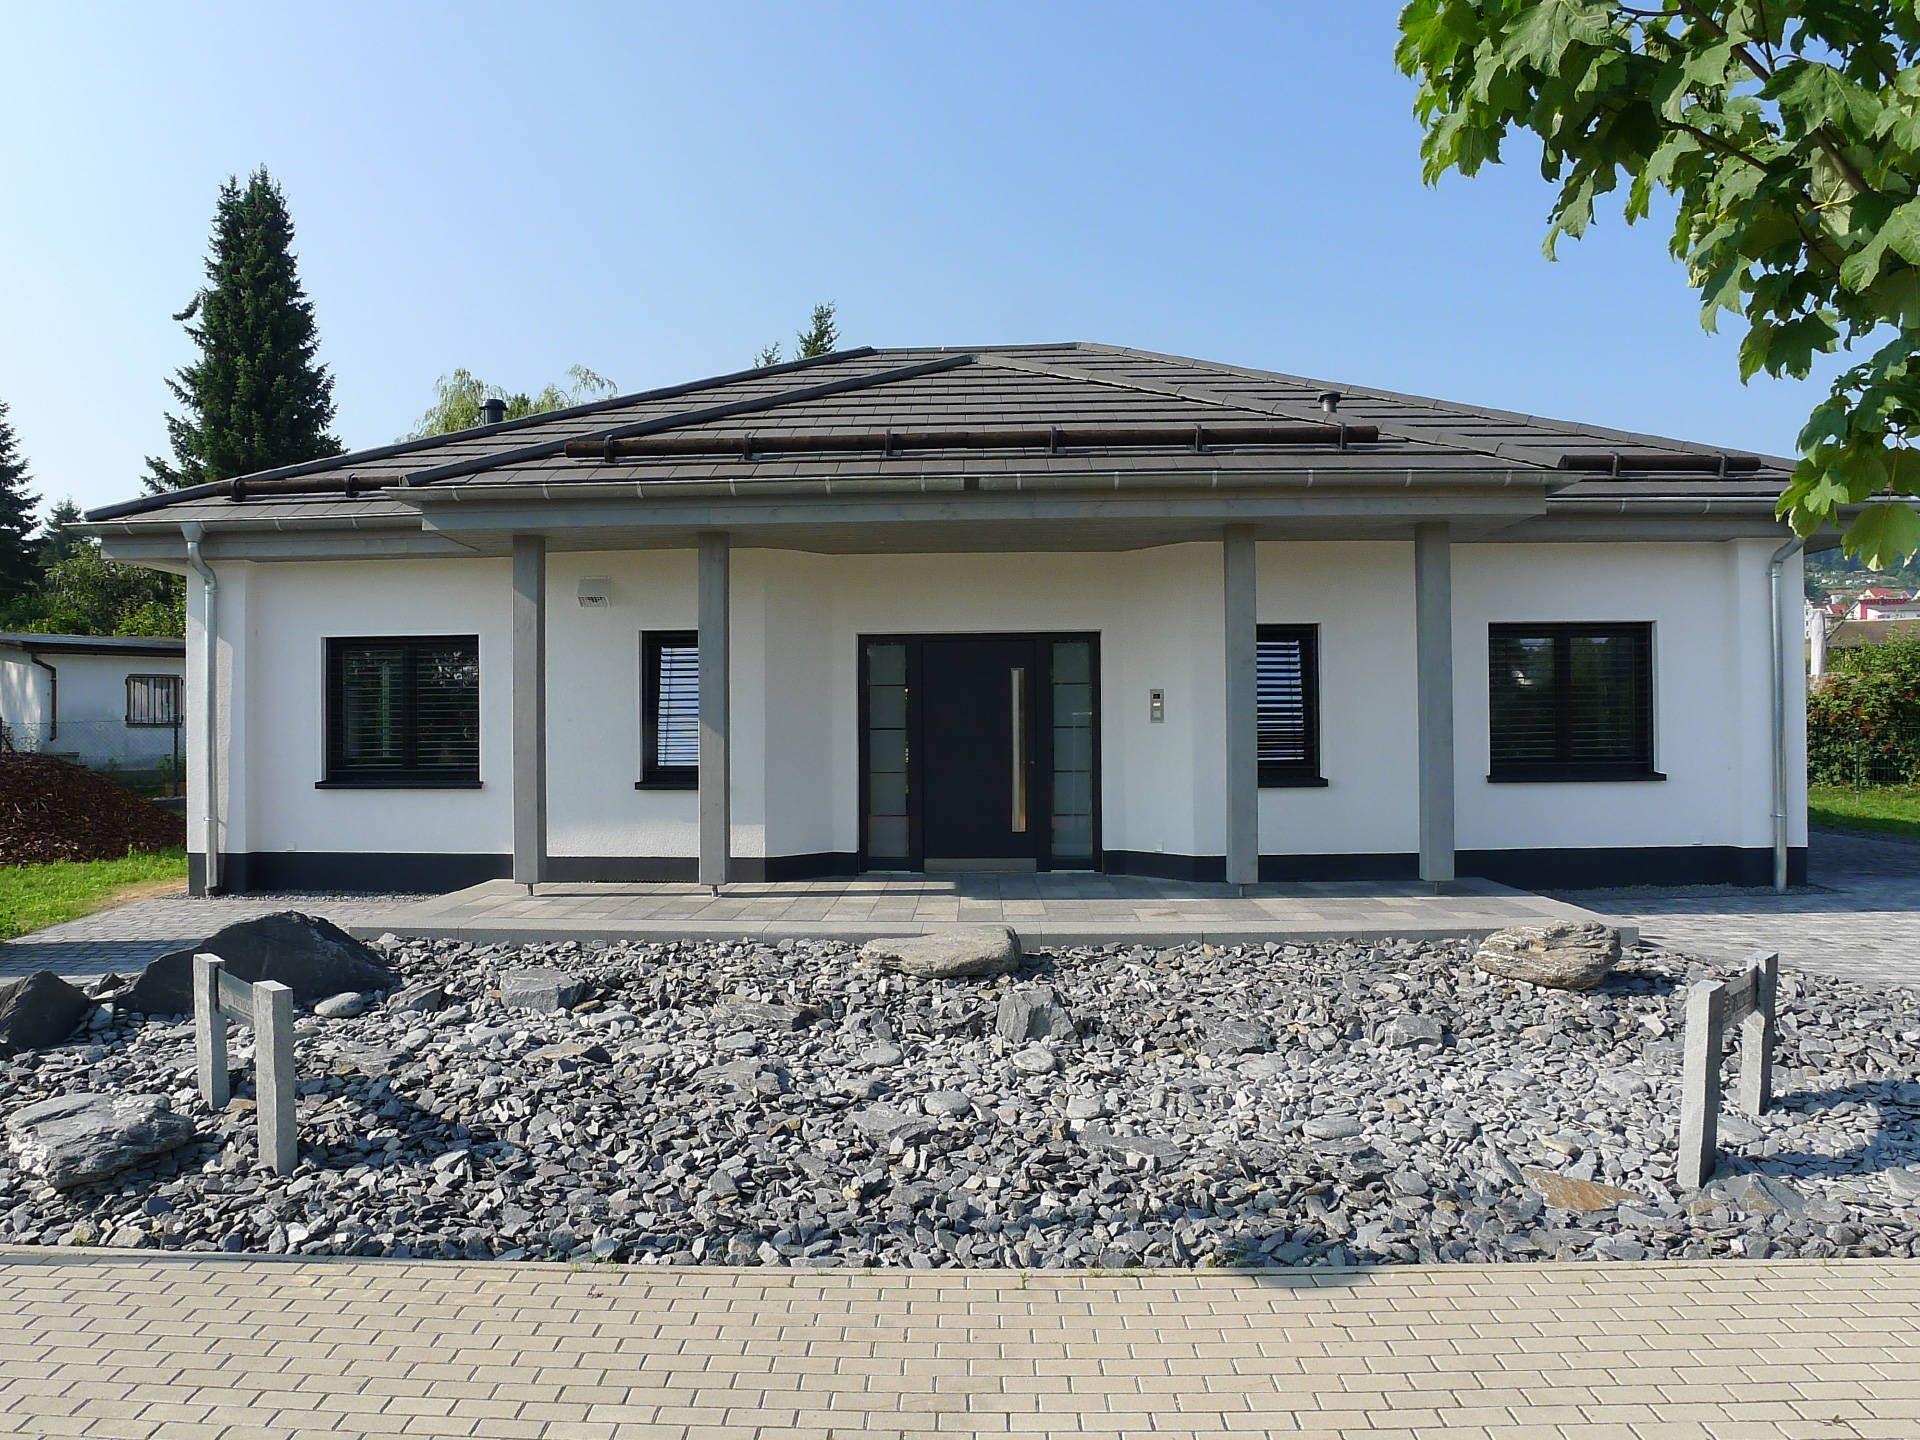 Musterhaus modern walmdach  Musterhaus Ilmenau • Musterhaus von HSE Massivhaus • Individuelles ...